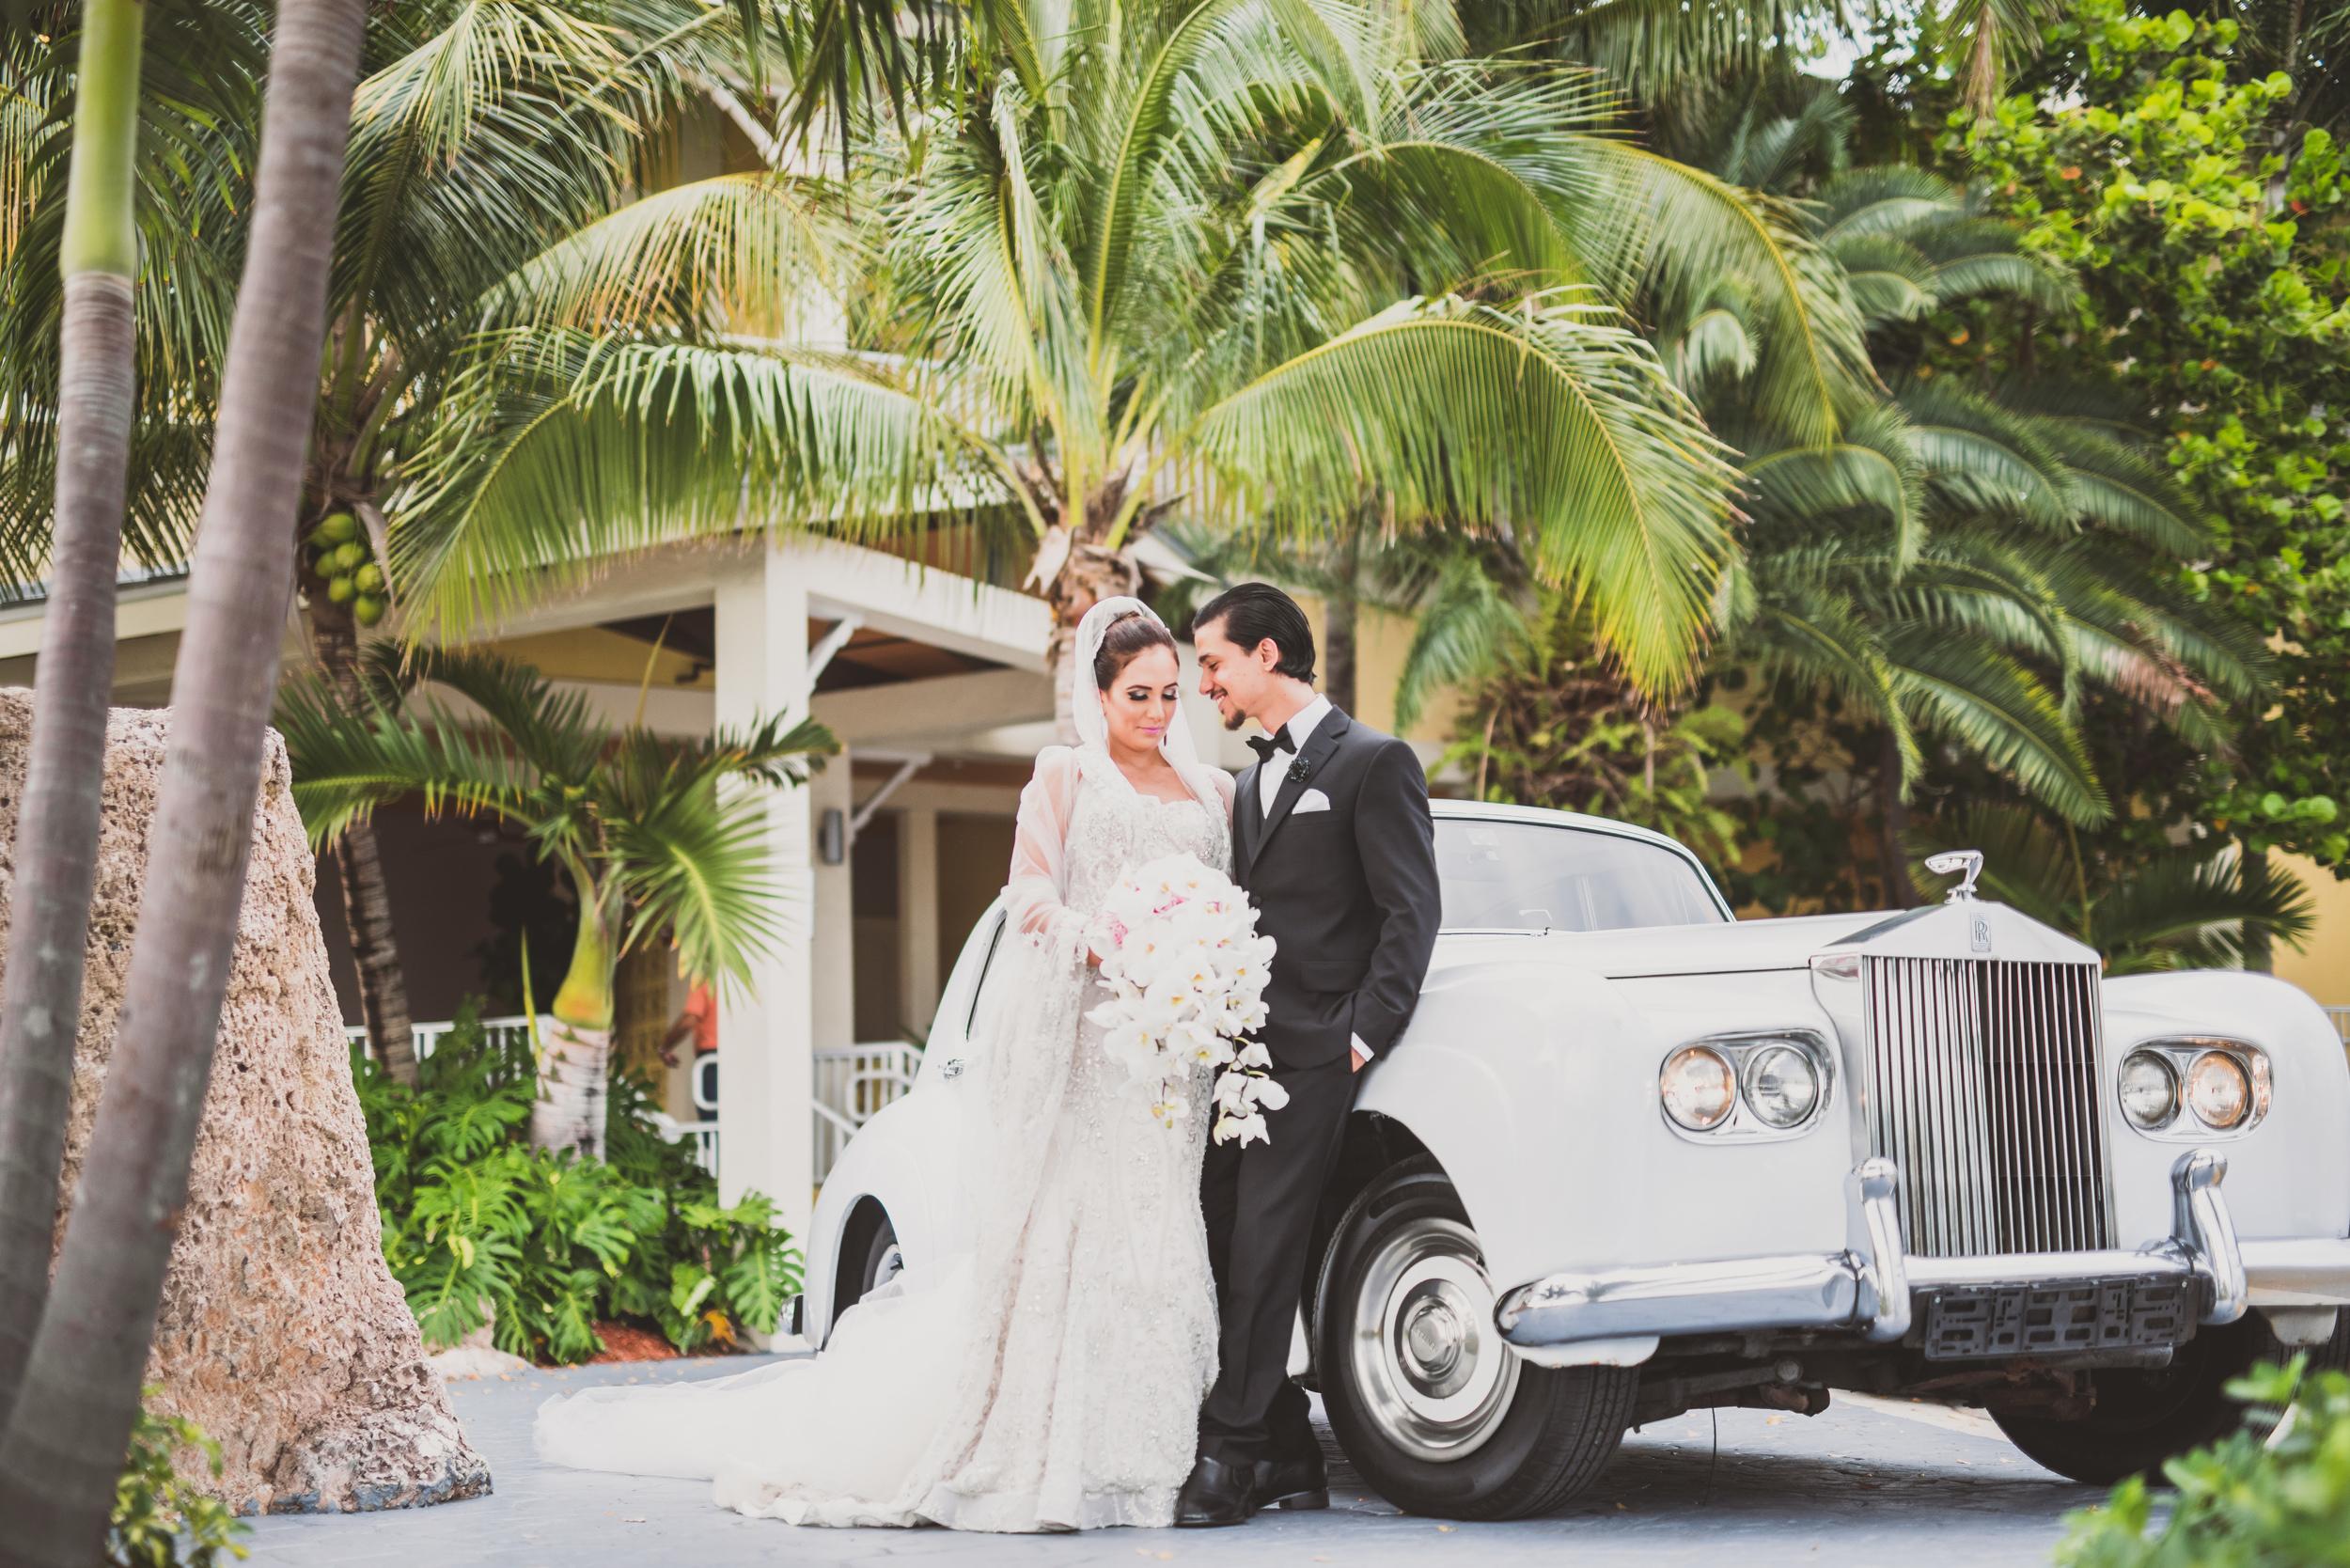 Suzannes & Omar's Wedding | Highlights-0031.jpg